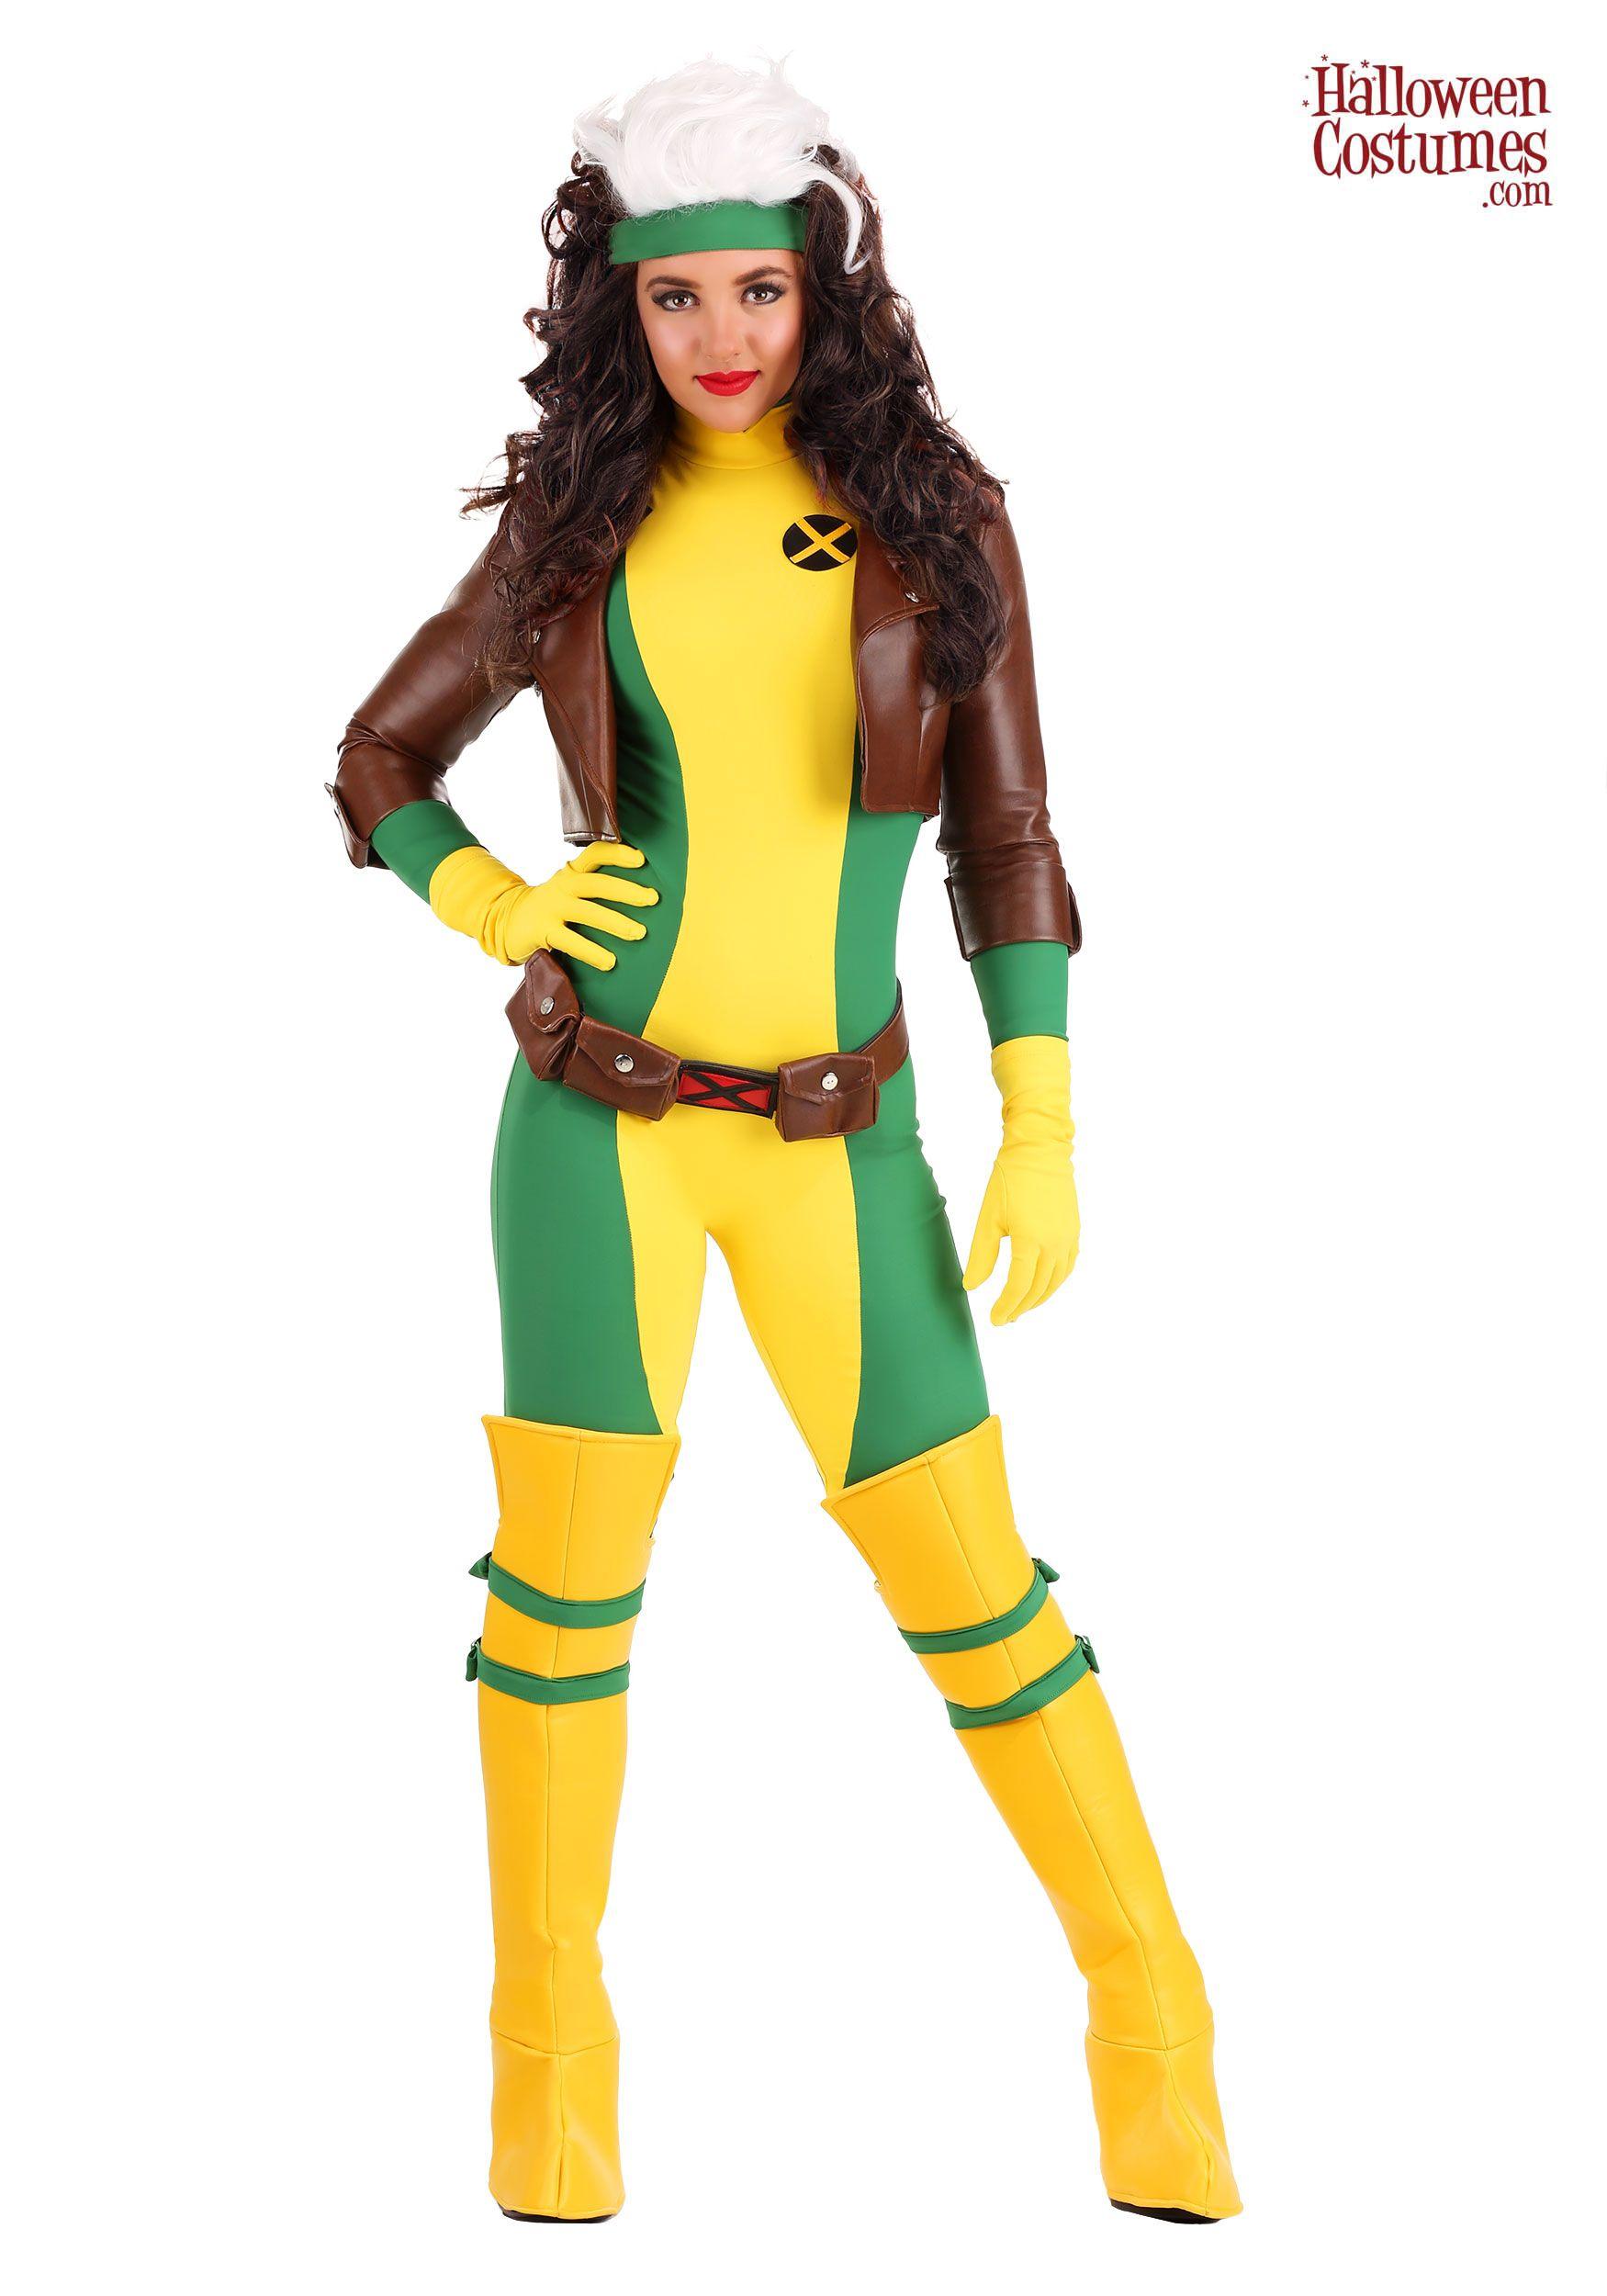 XMen Women's Rogue Premium Costume Halloween costumes